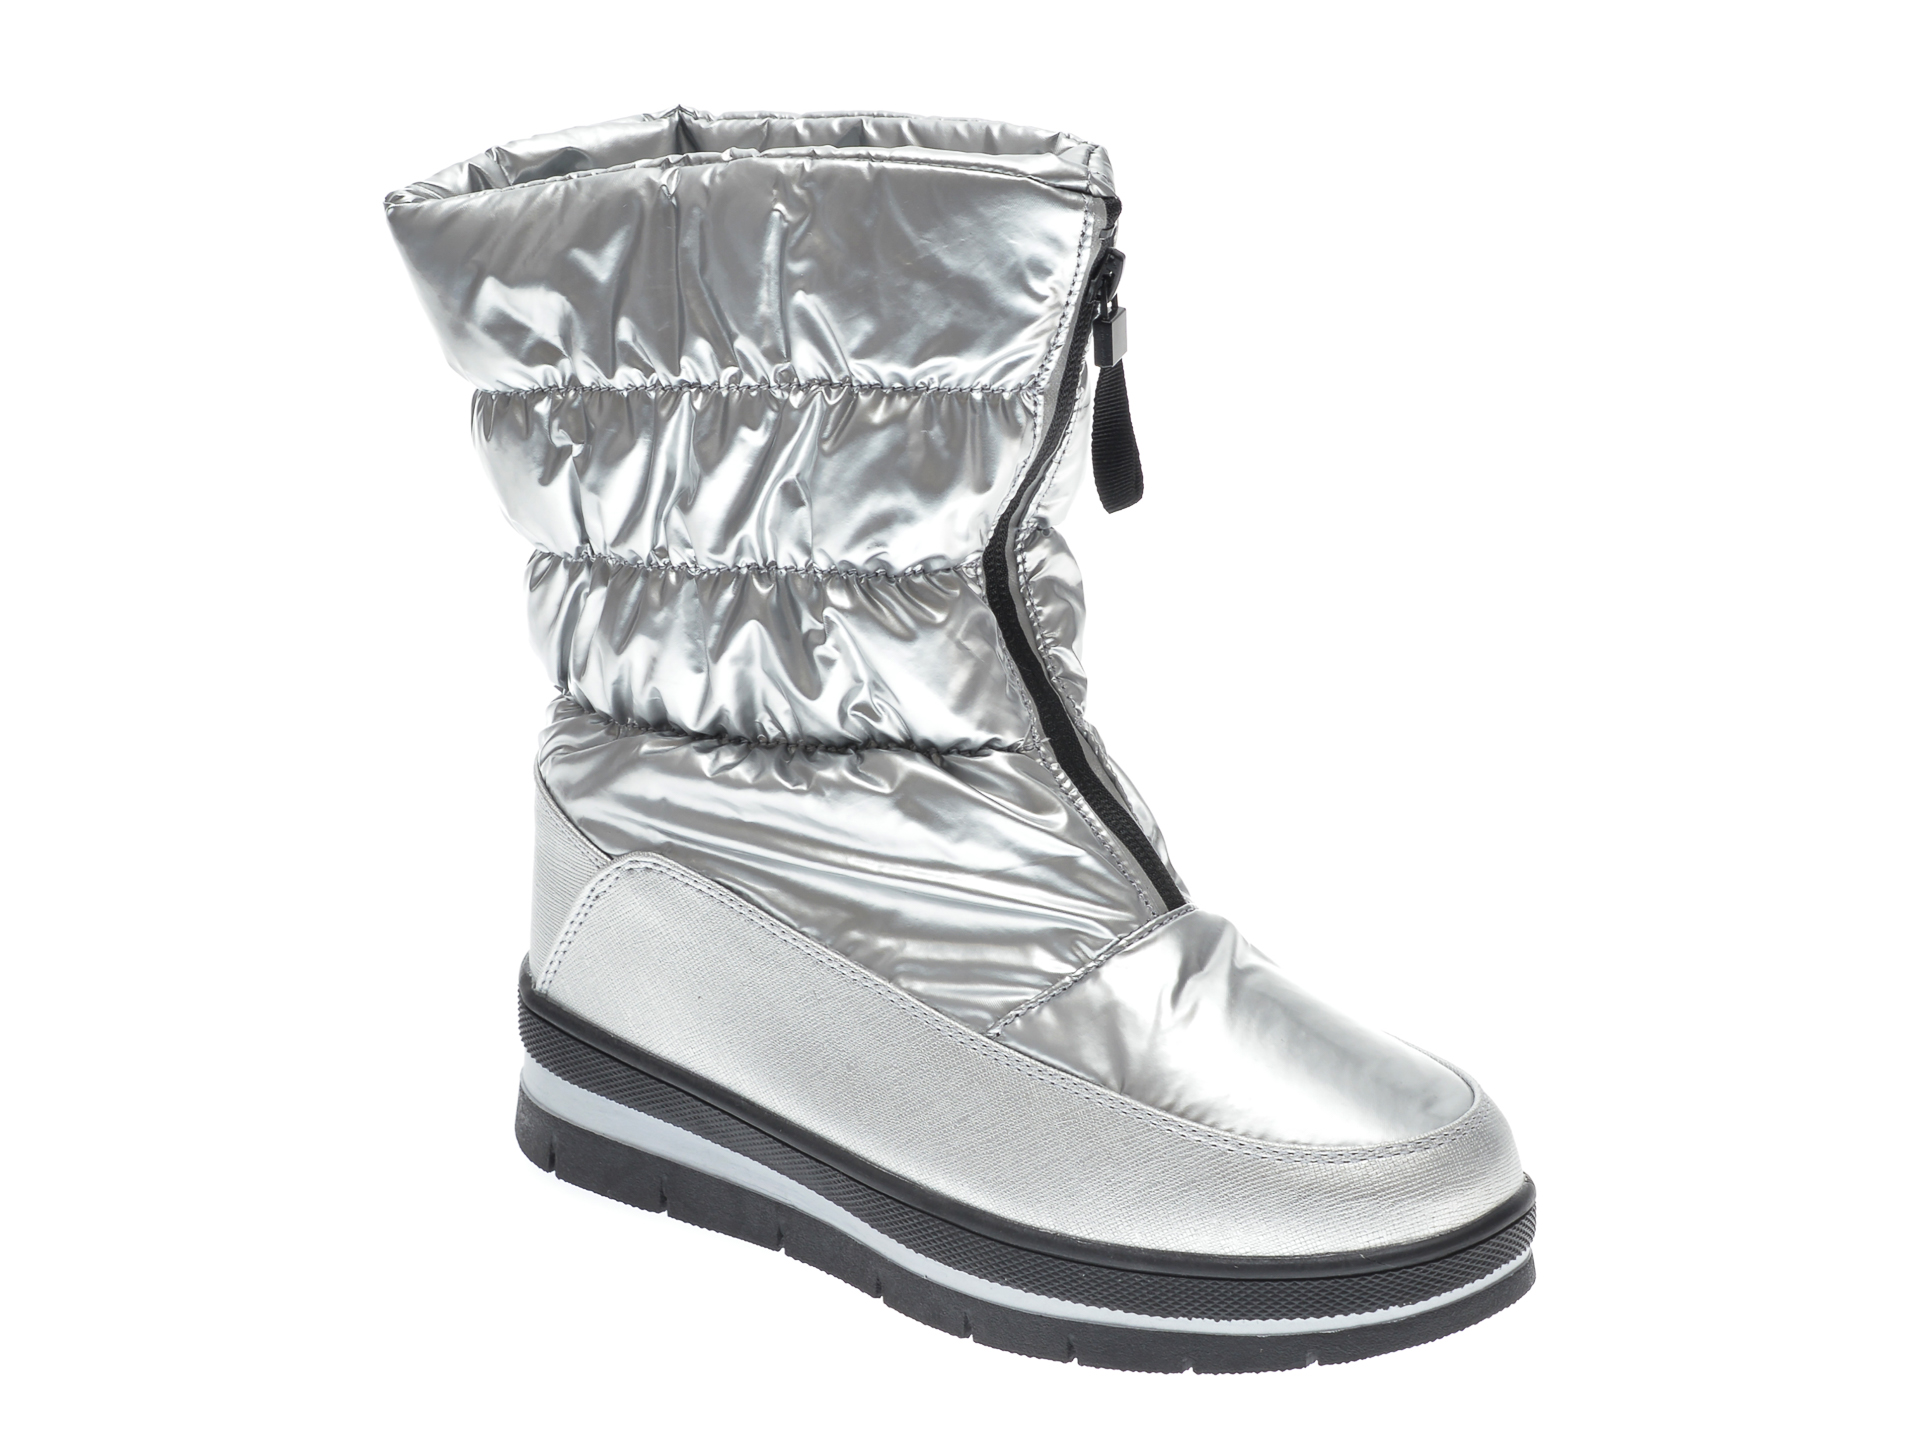 Ghete RIO FIORE argintii, 6497A, din material textil si piele ecologica